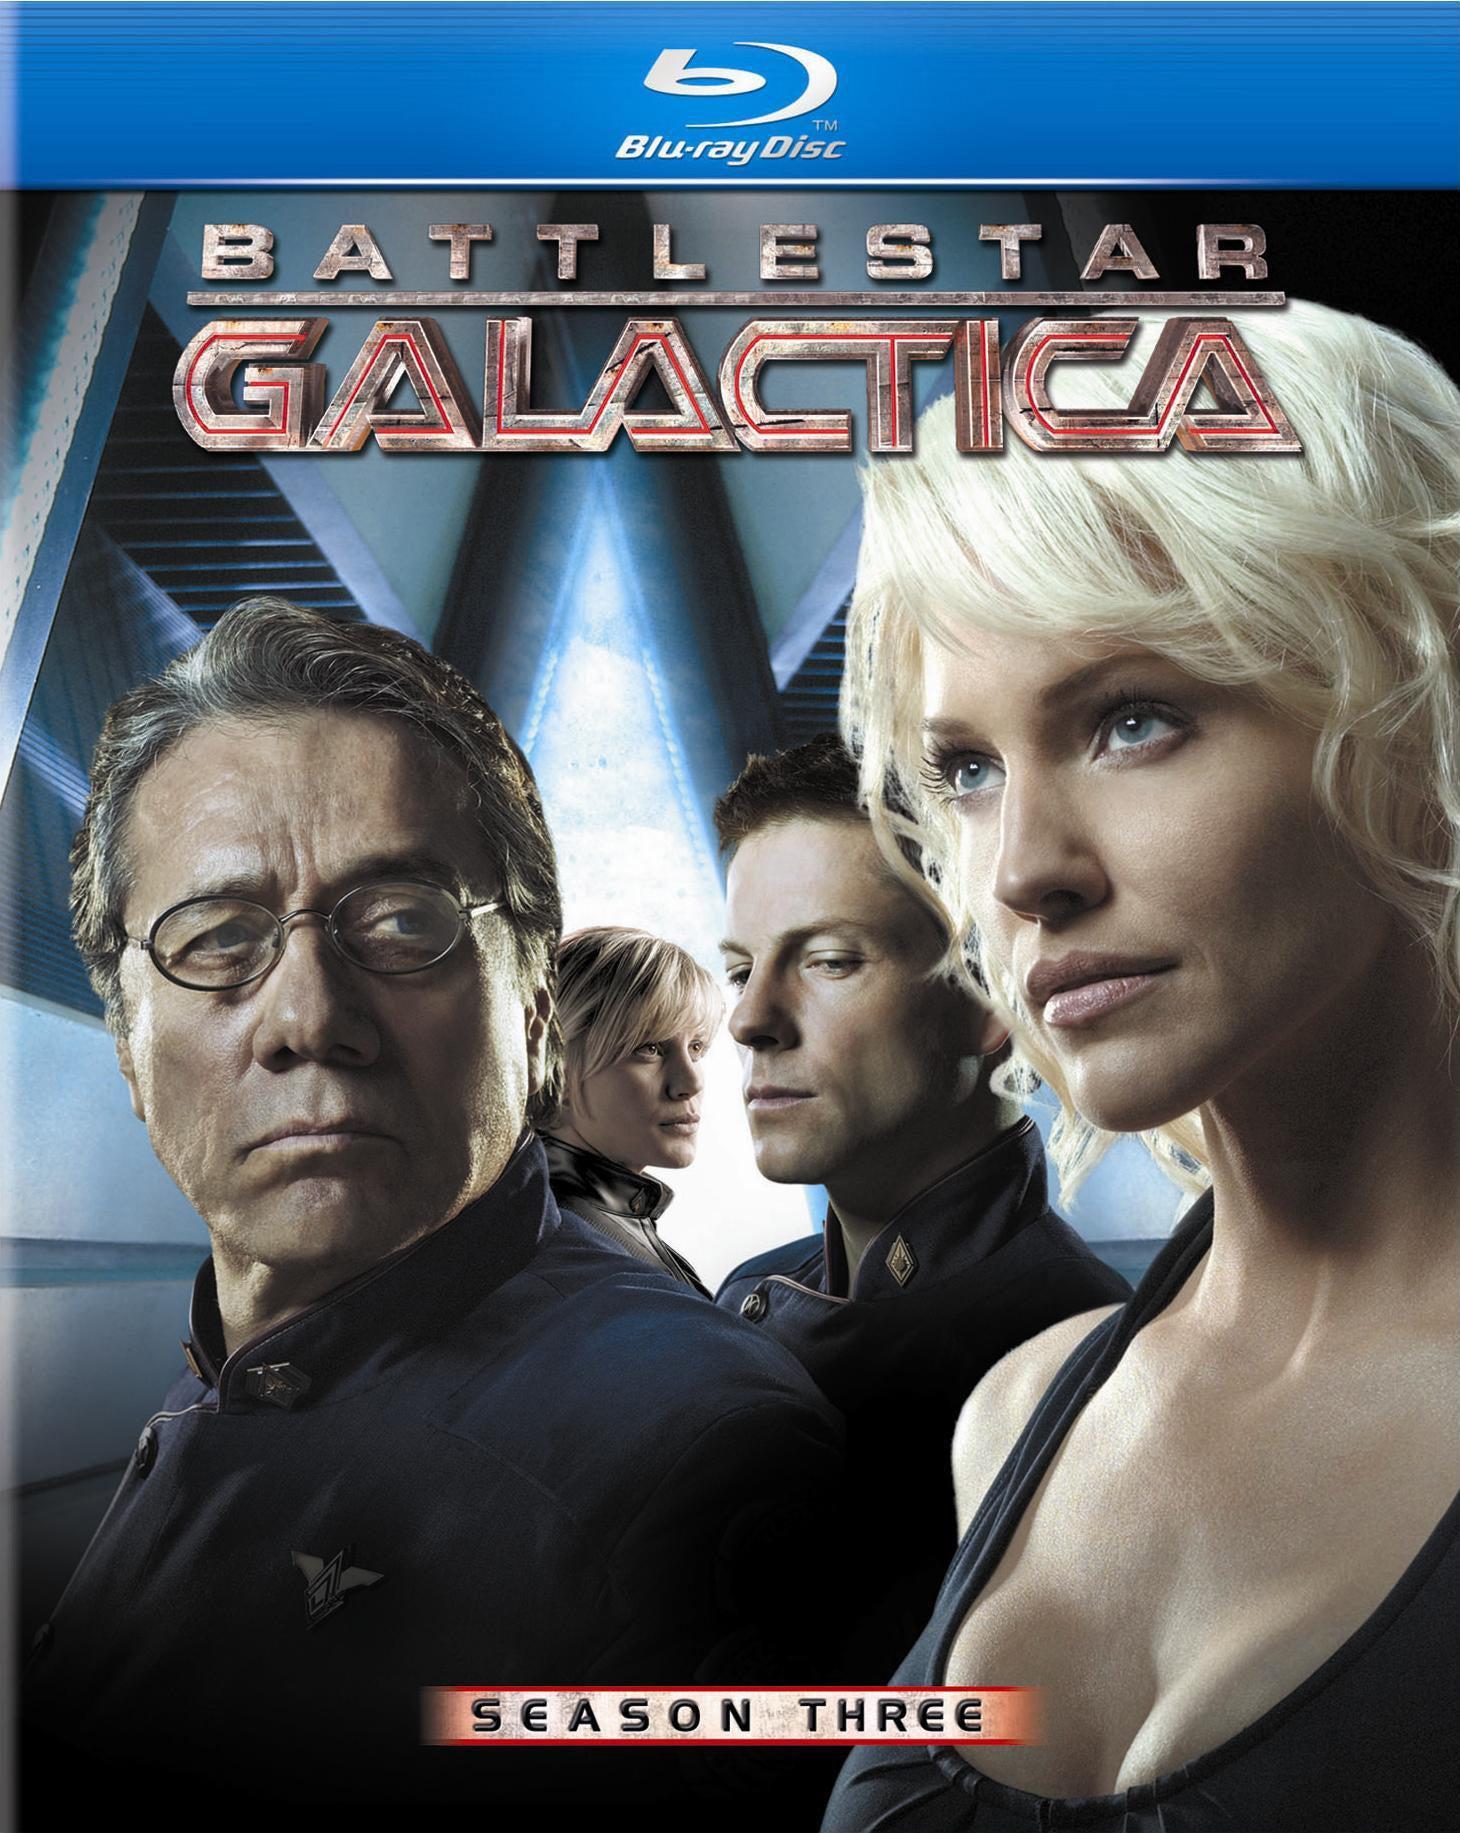 Battlestar Galactica: Season Three (Blu-ray Disc)